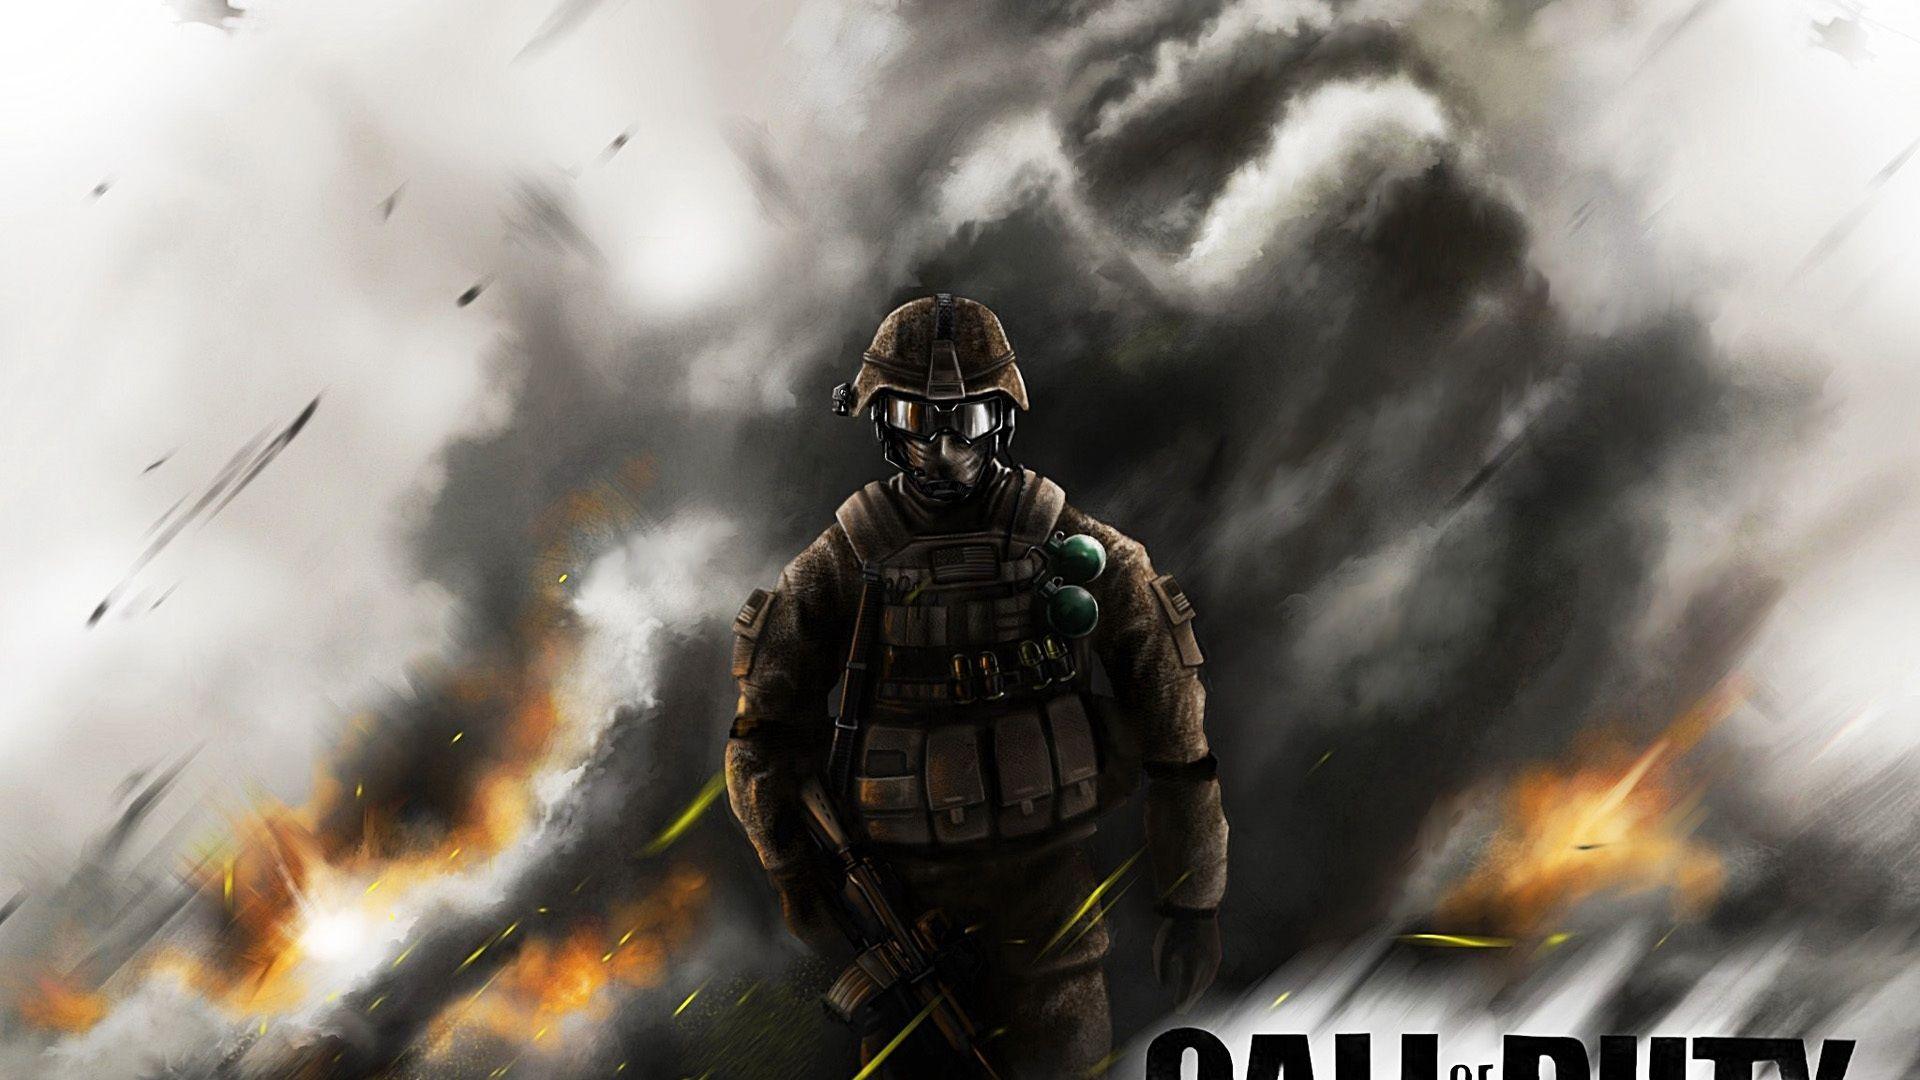 Call of duty modern warfare wallpapers - SF Wallpaper